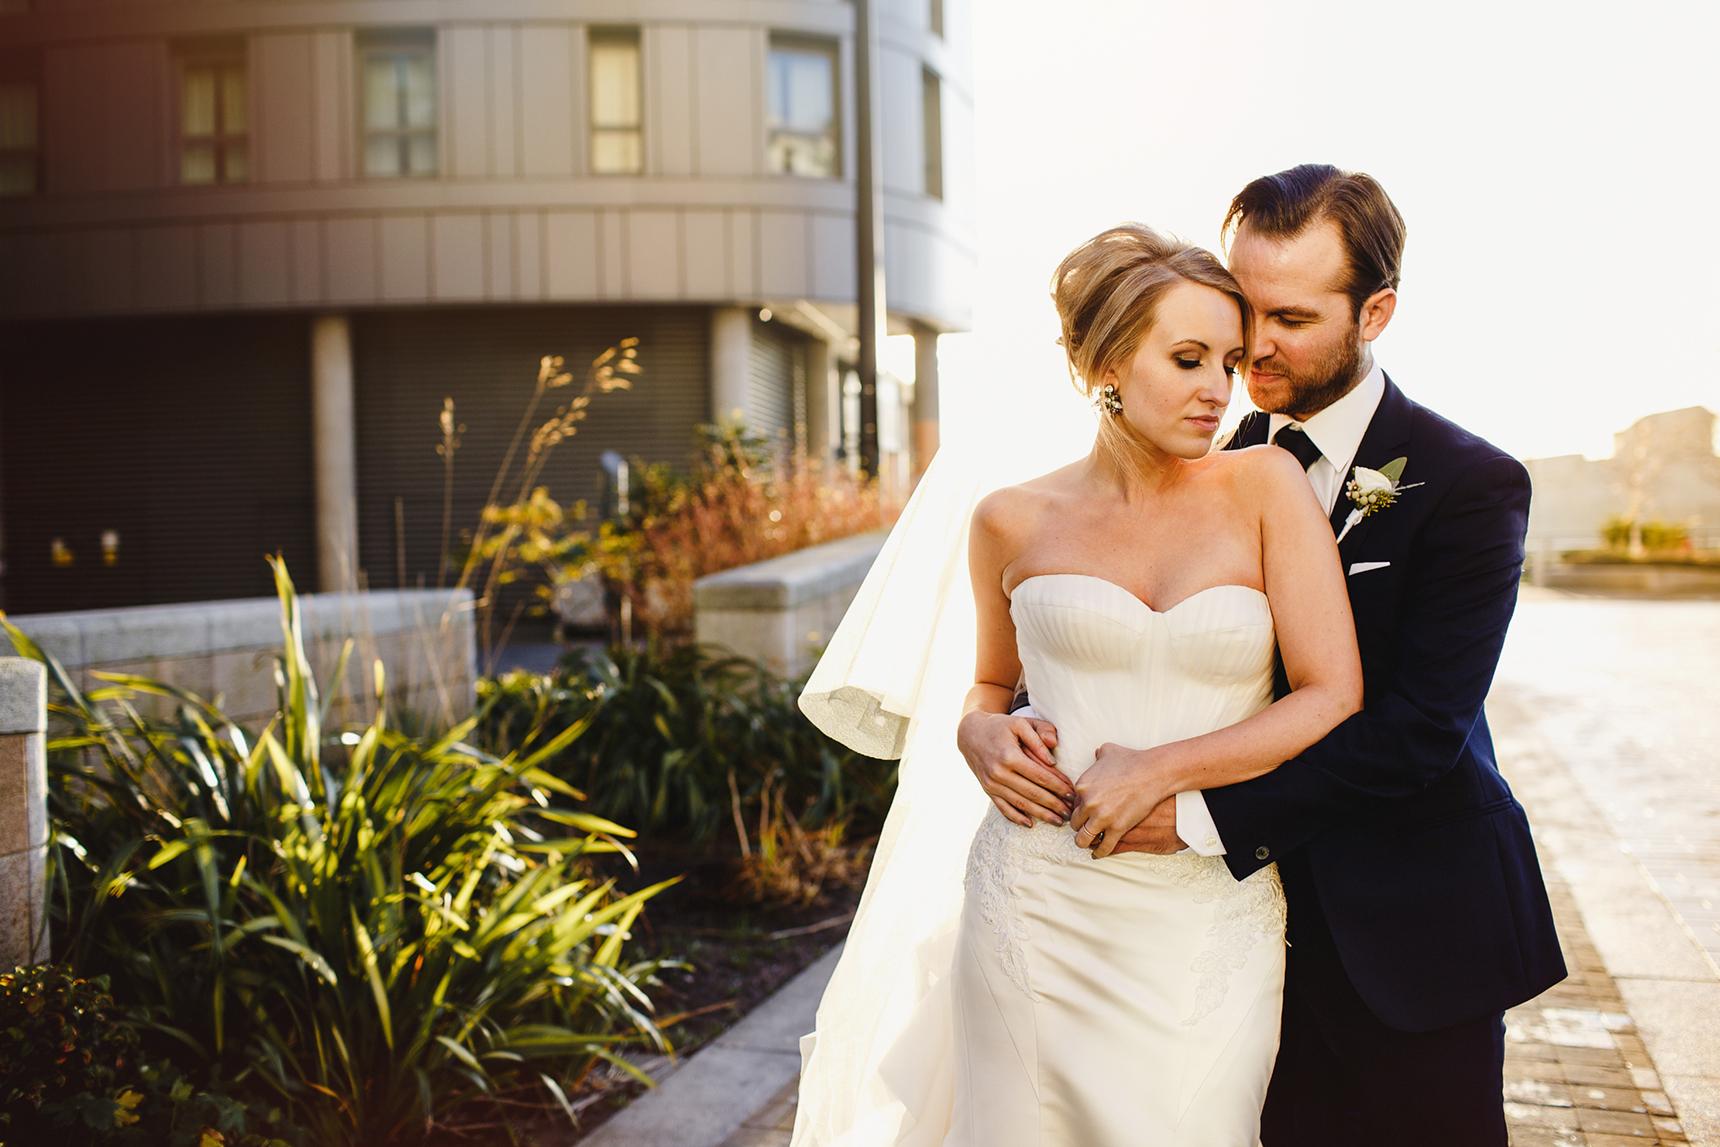 wedding photographer Media City